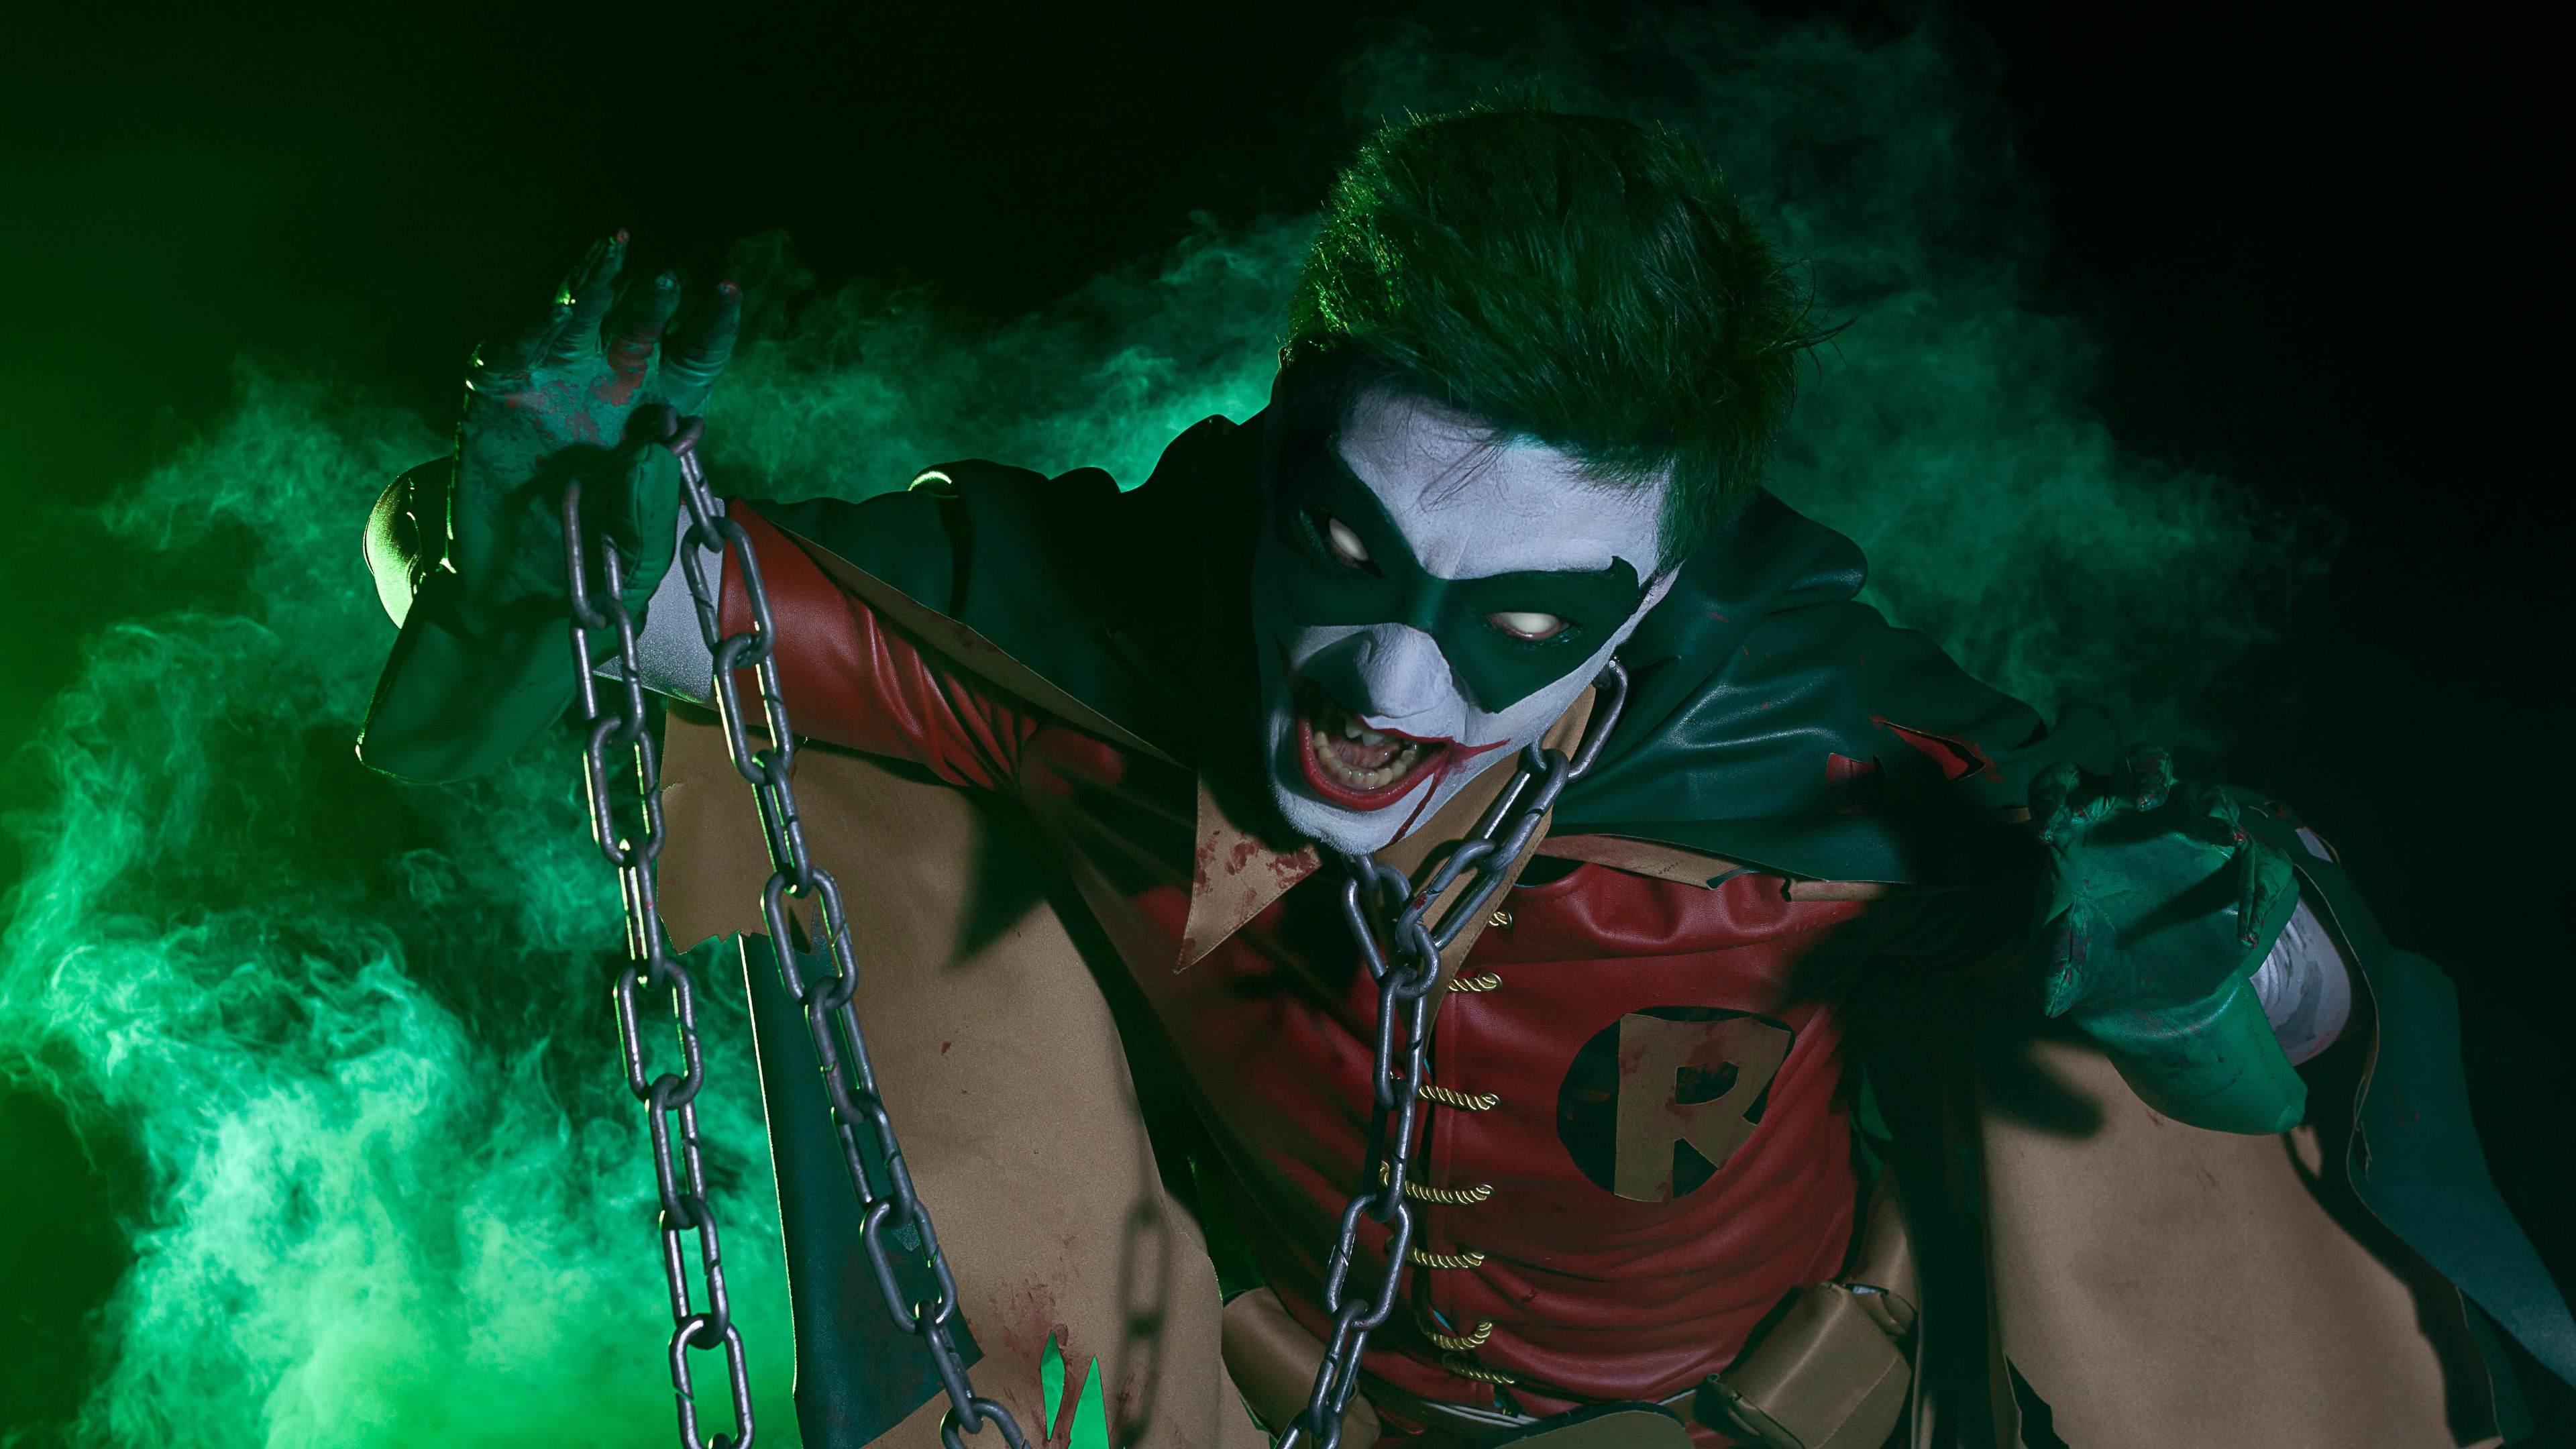 robin as joker cosplay 4k 1544286640 - Robin As Joker Cosplay 4k - superheroes wallpapers, robin wallpapers, hd-wallpapers, cosplay wallpapers, 4k-wallpapers